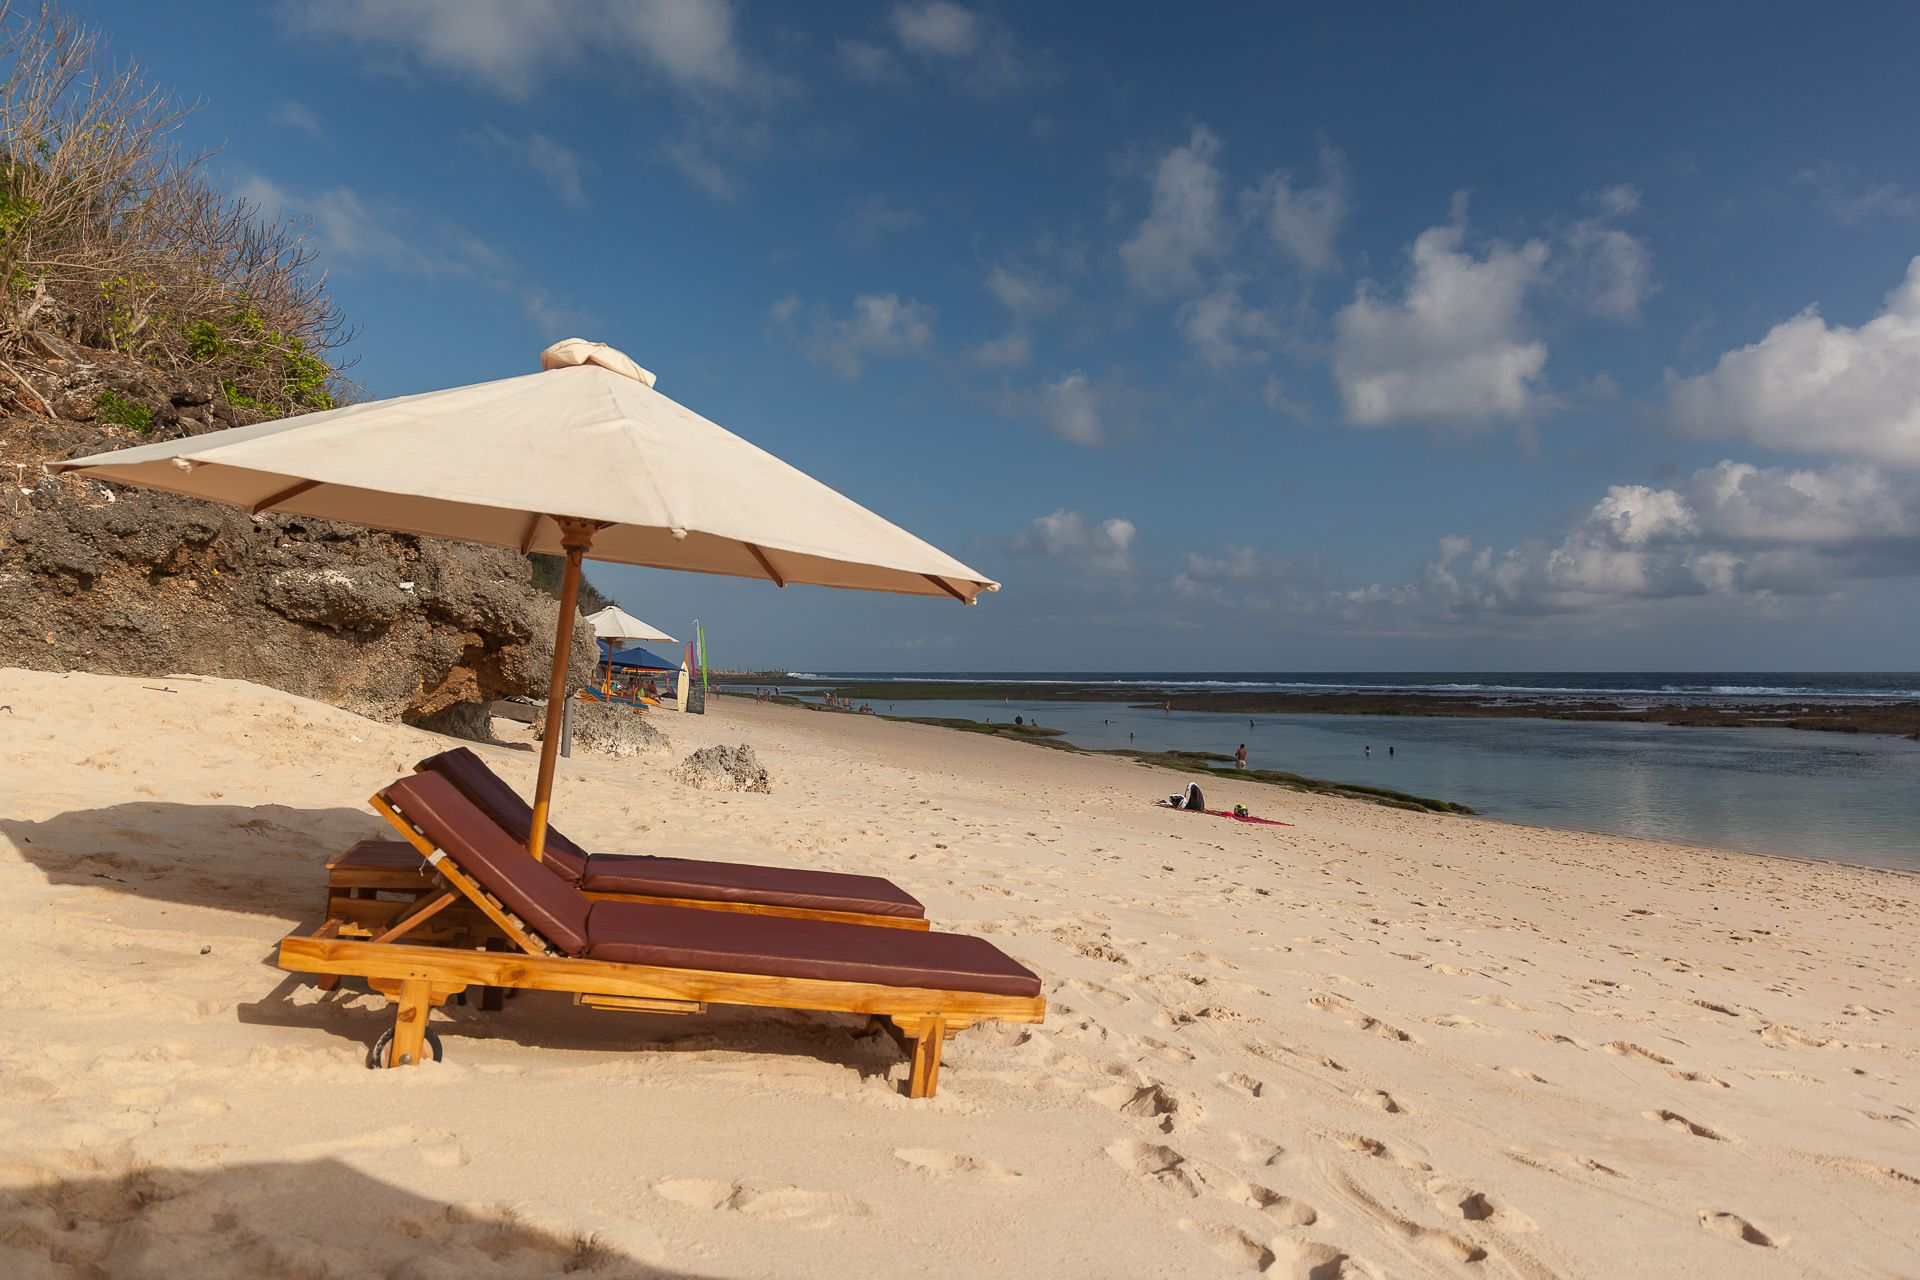 Bali, Indonesia, Bali beaches, beach bali, summer, ocean, sea, Bali sea, Indian ocean, Бали, пляжи Бали, пляжный отдых на Бали, где купаться на Бали, где белый песок на Бали, Бали море или океан, Индийский океан, море, лето, пляж, океан, волны, пляж карма бали, карма бали, карма бич бали, karma beach bali